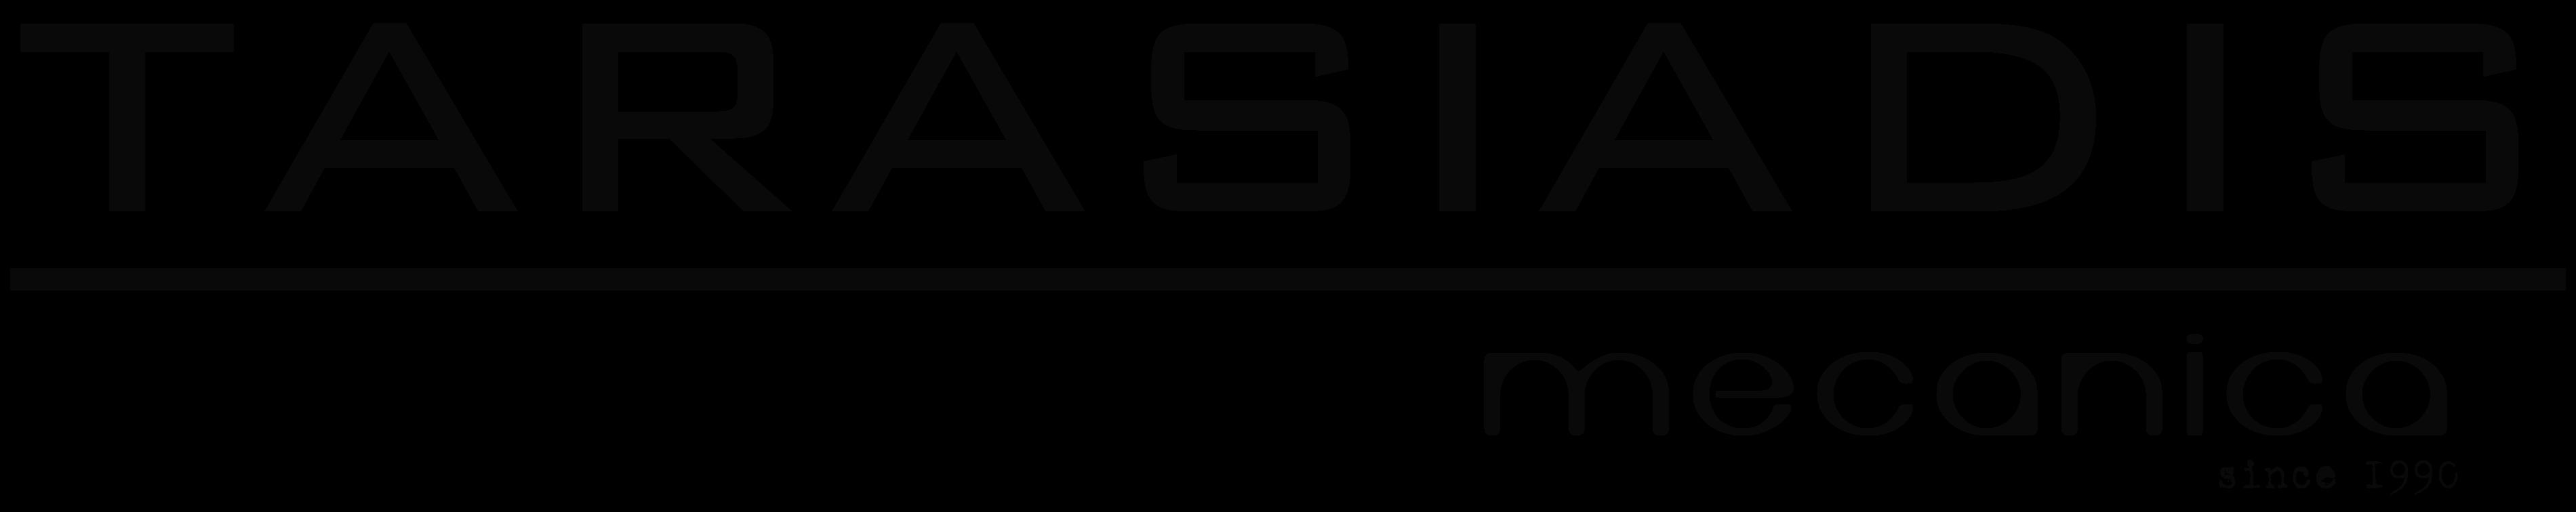 Tarasiadis